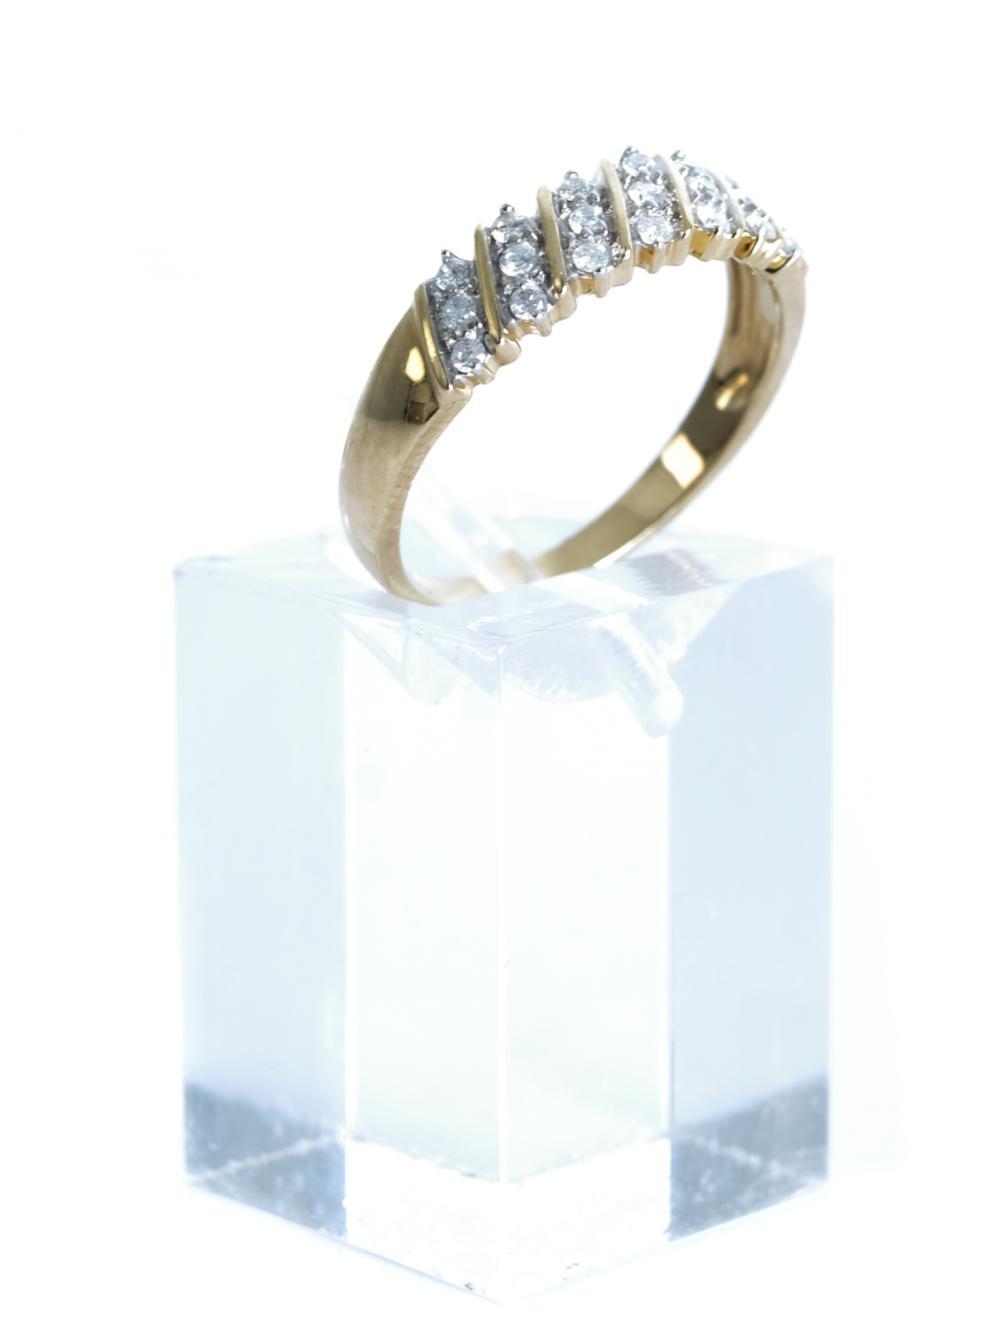 10K Yellow Gold & Diamond Ring, Size 7